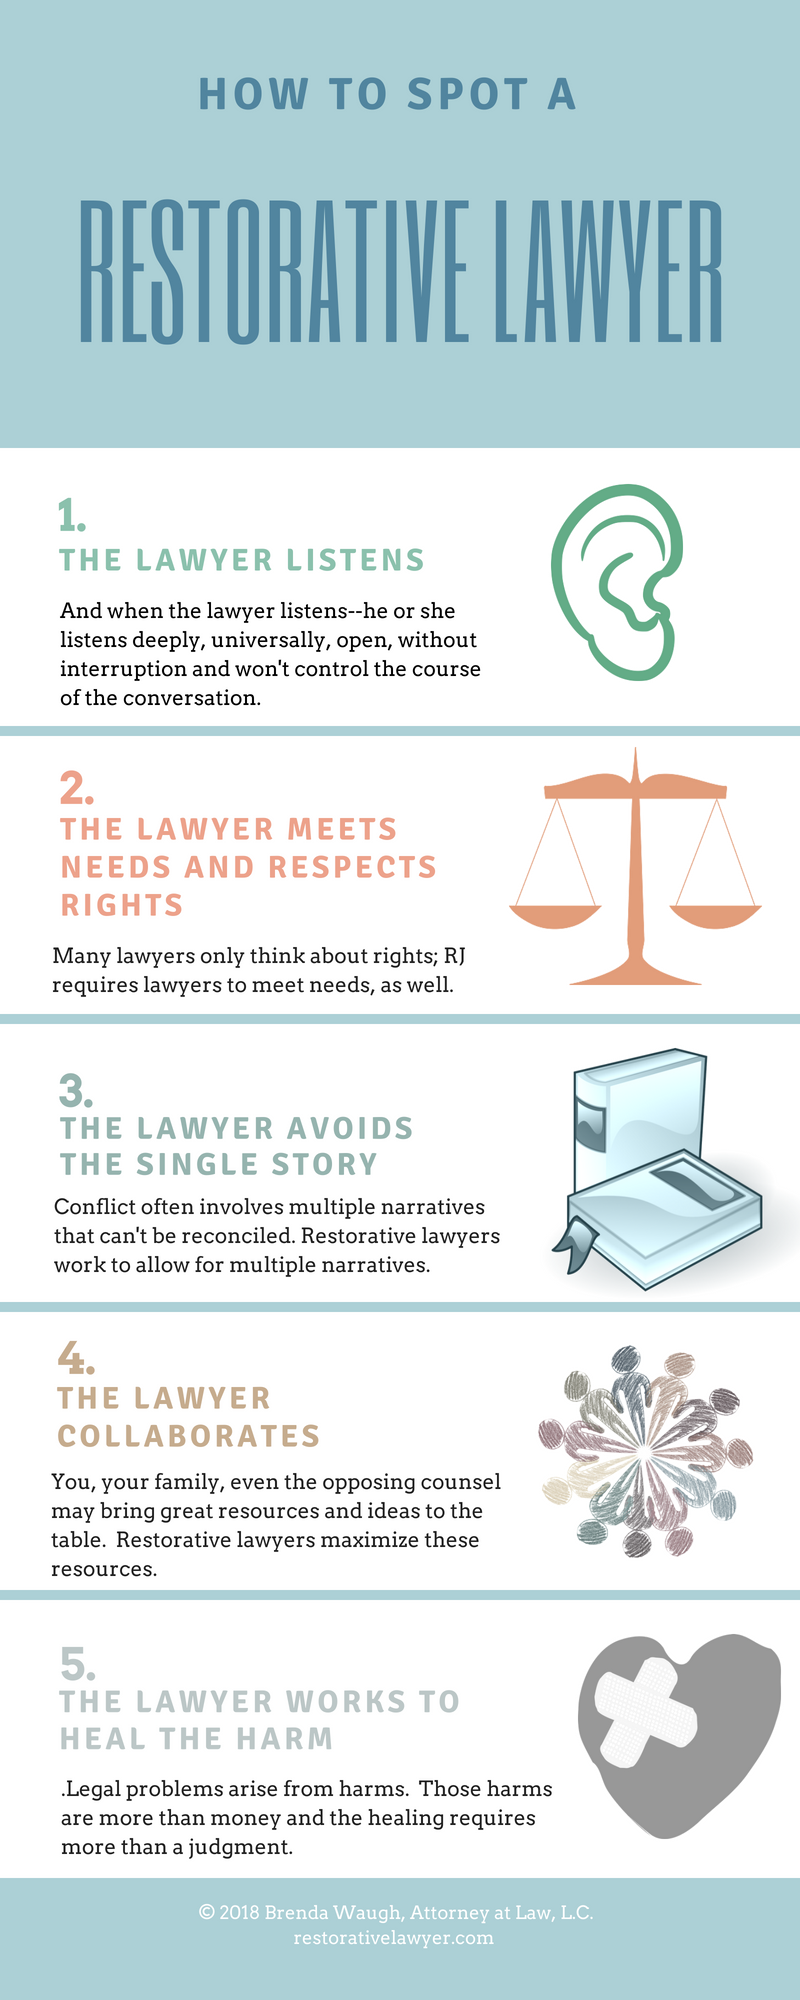 Brenda Waugh How to Spot a Restorative Lawyer